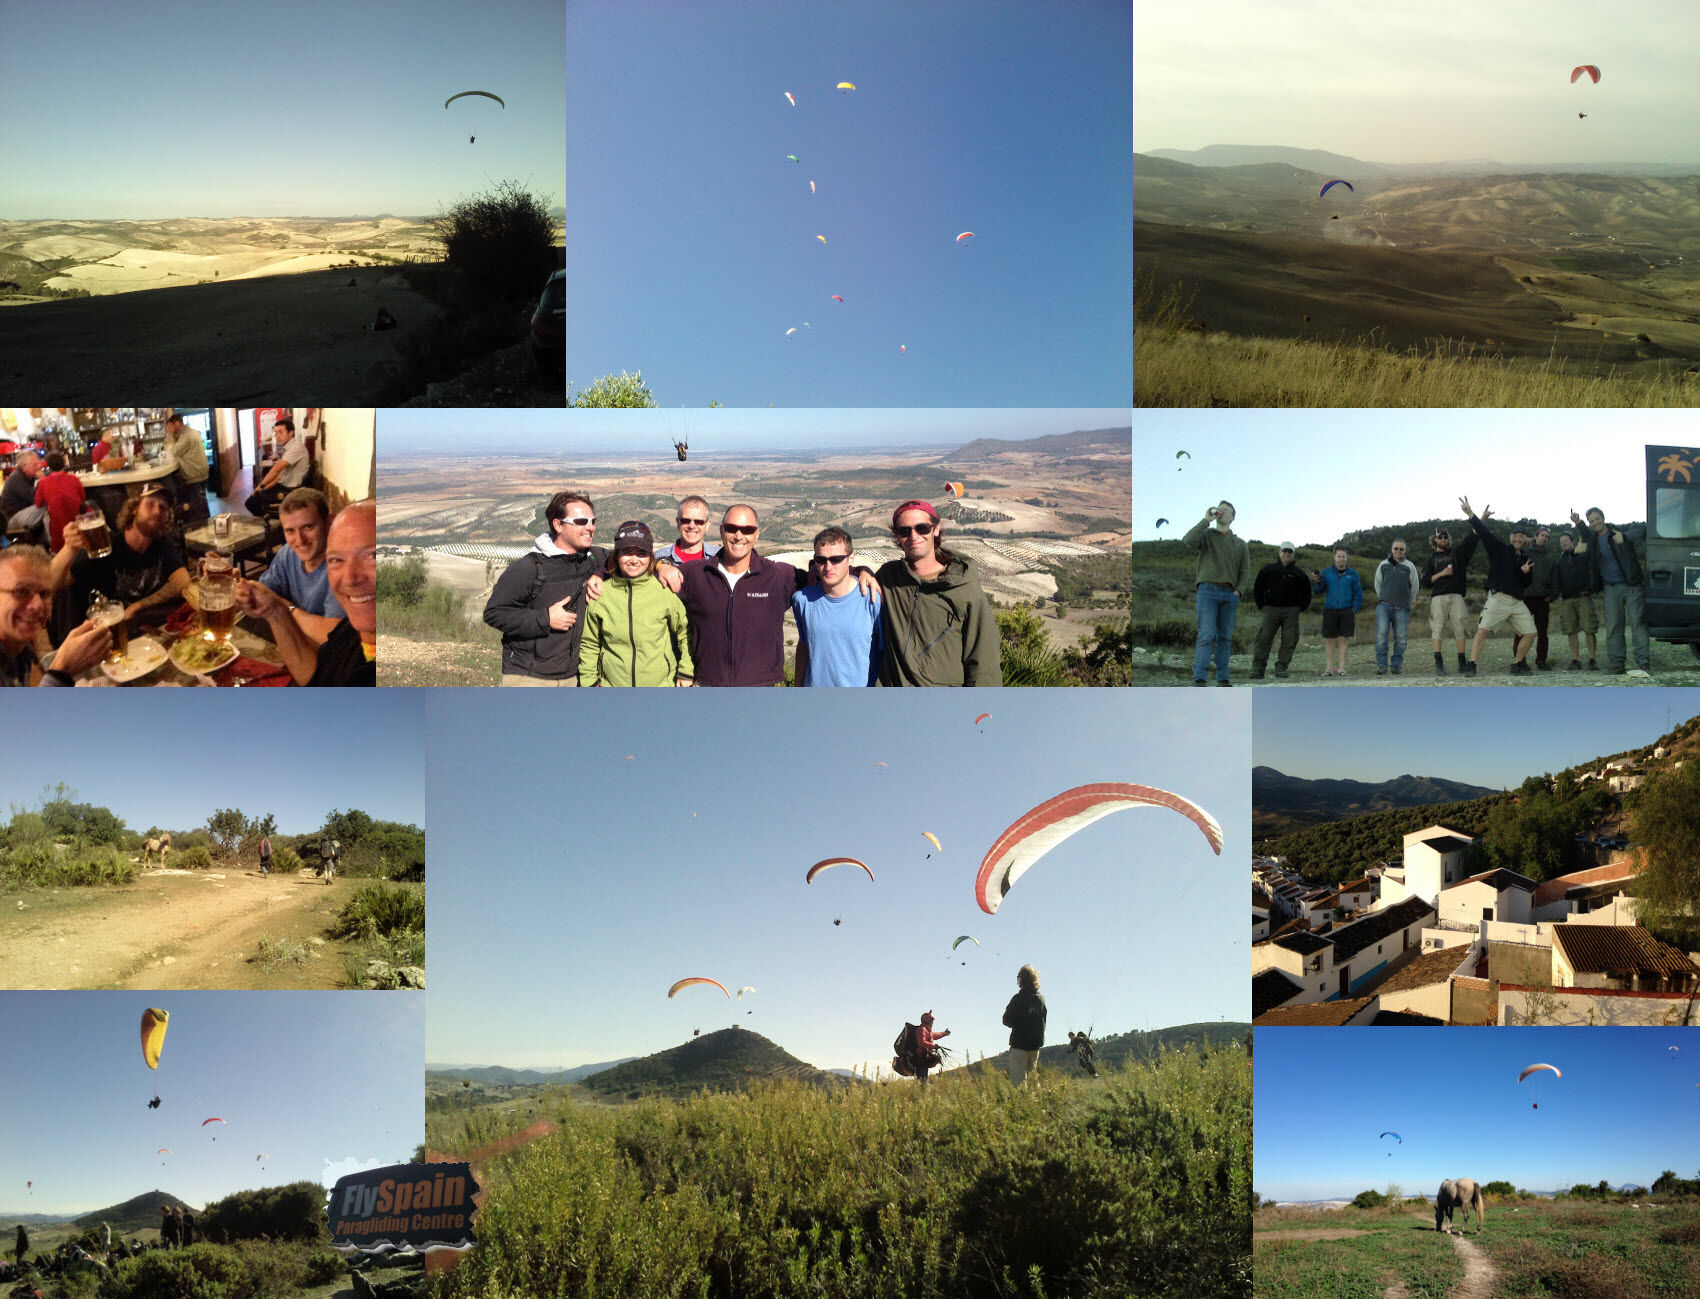 December Beginners paragliding course for 2013 is mega popular